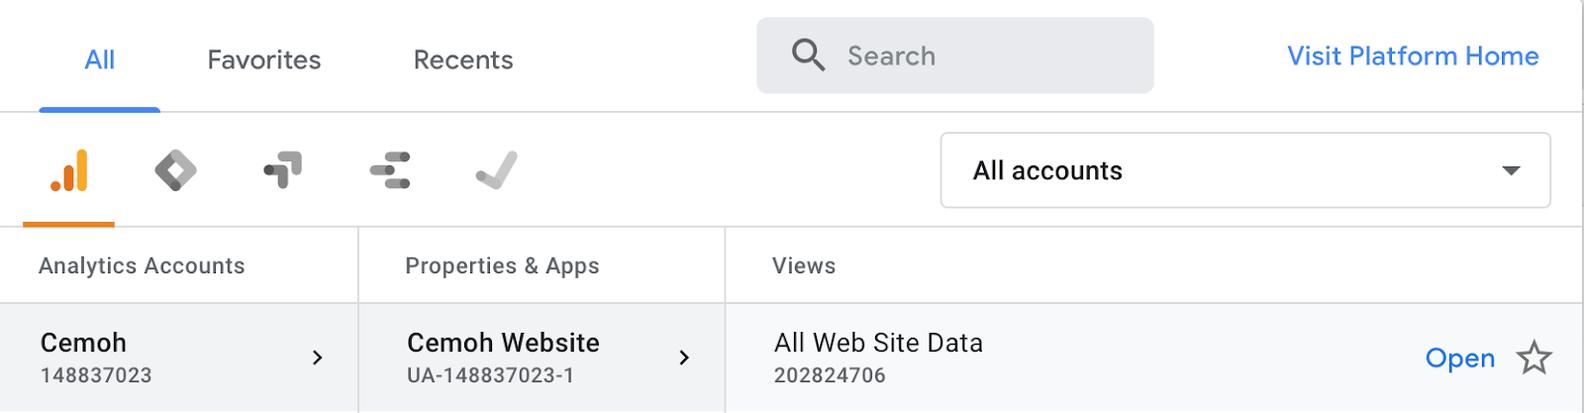 google analytics account property view